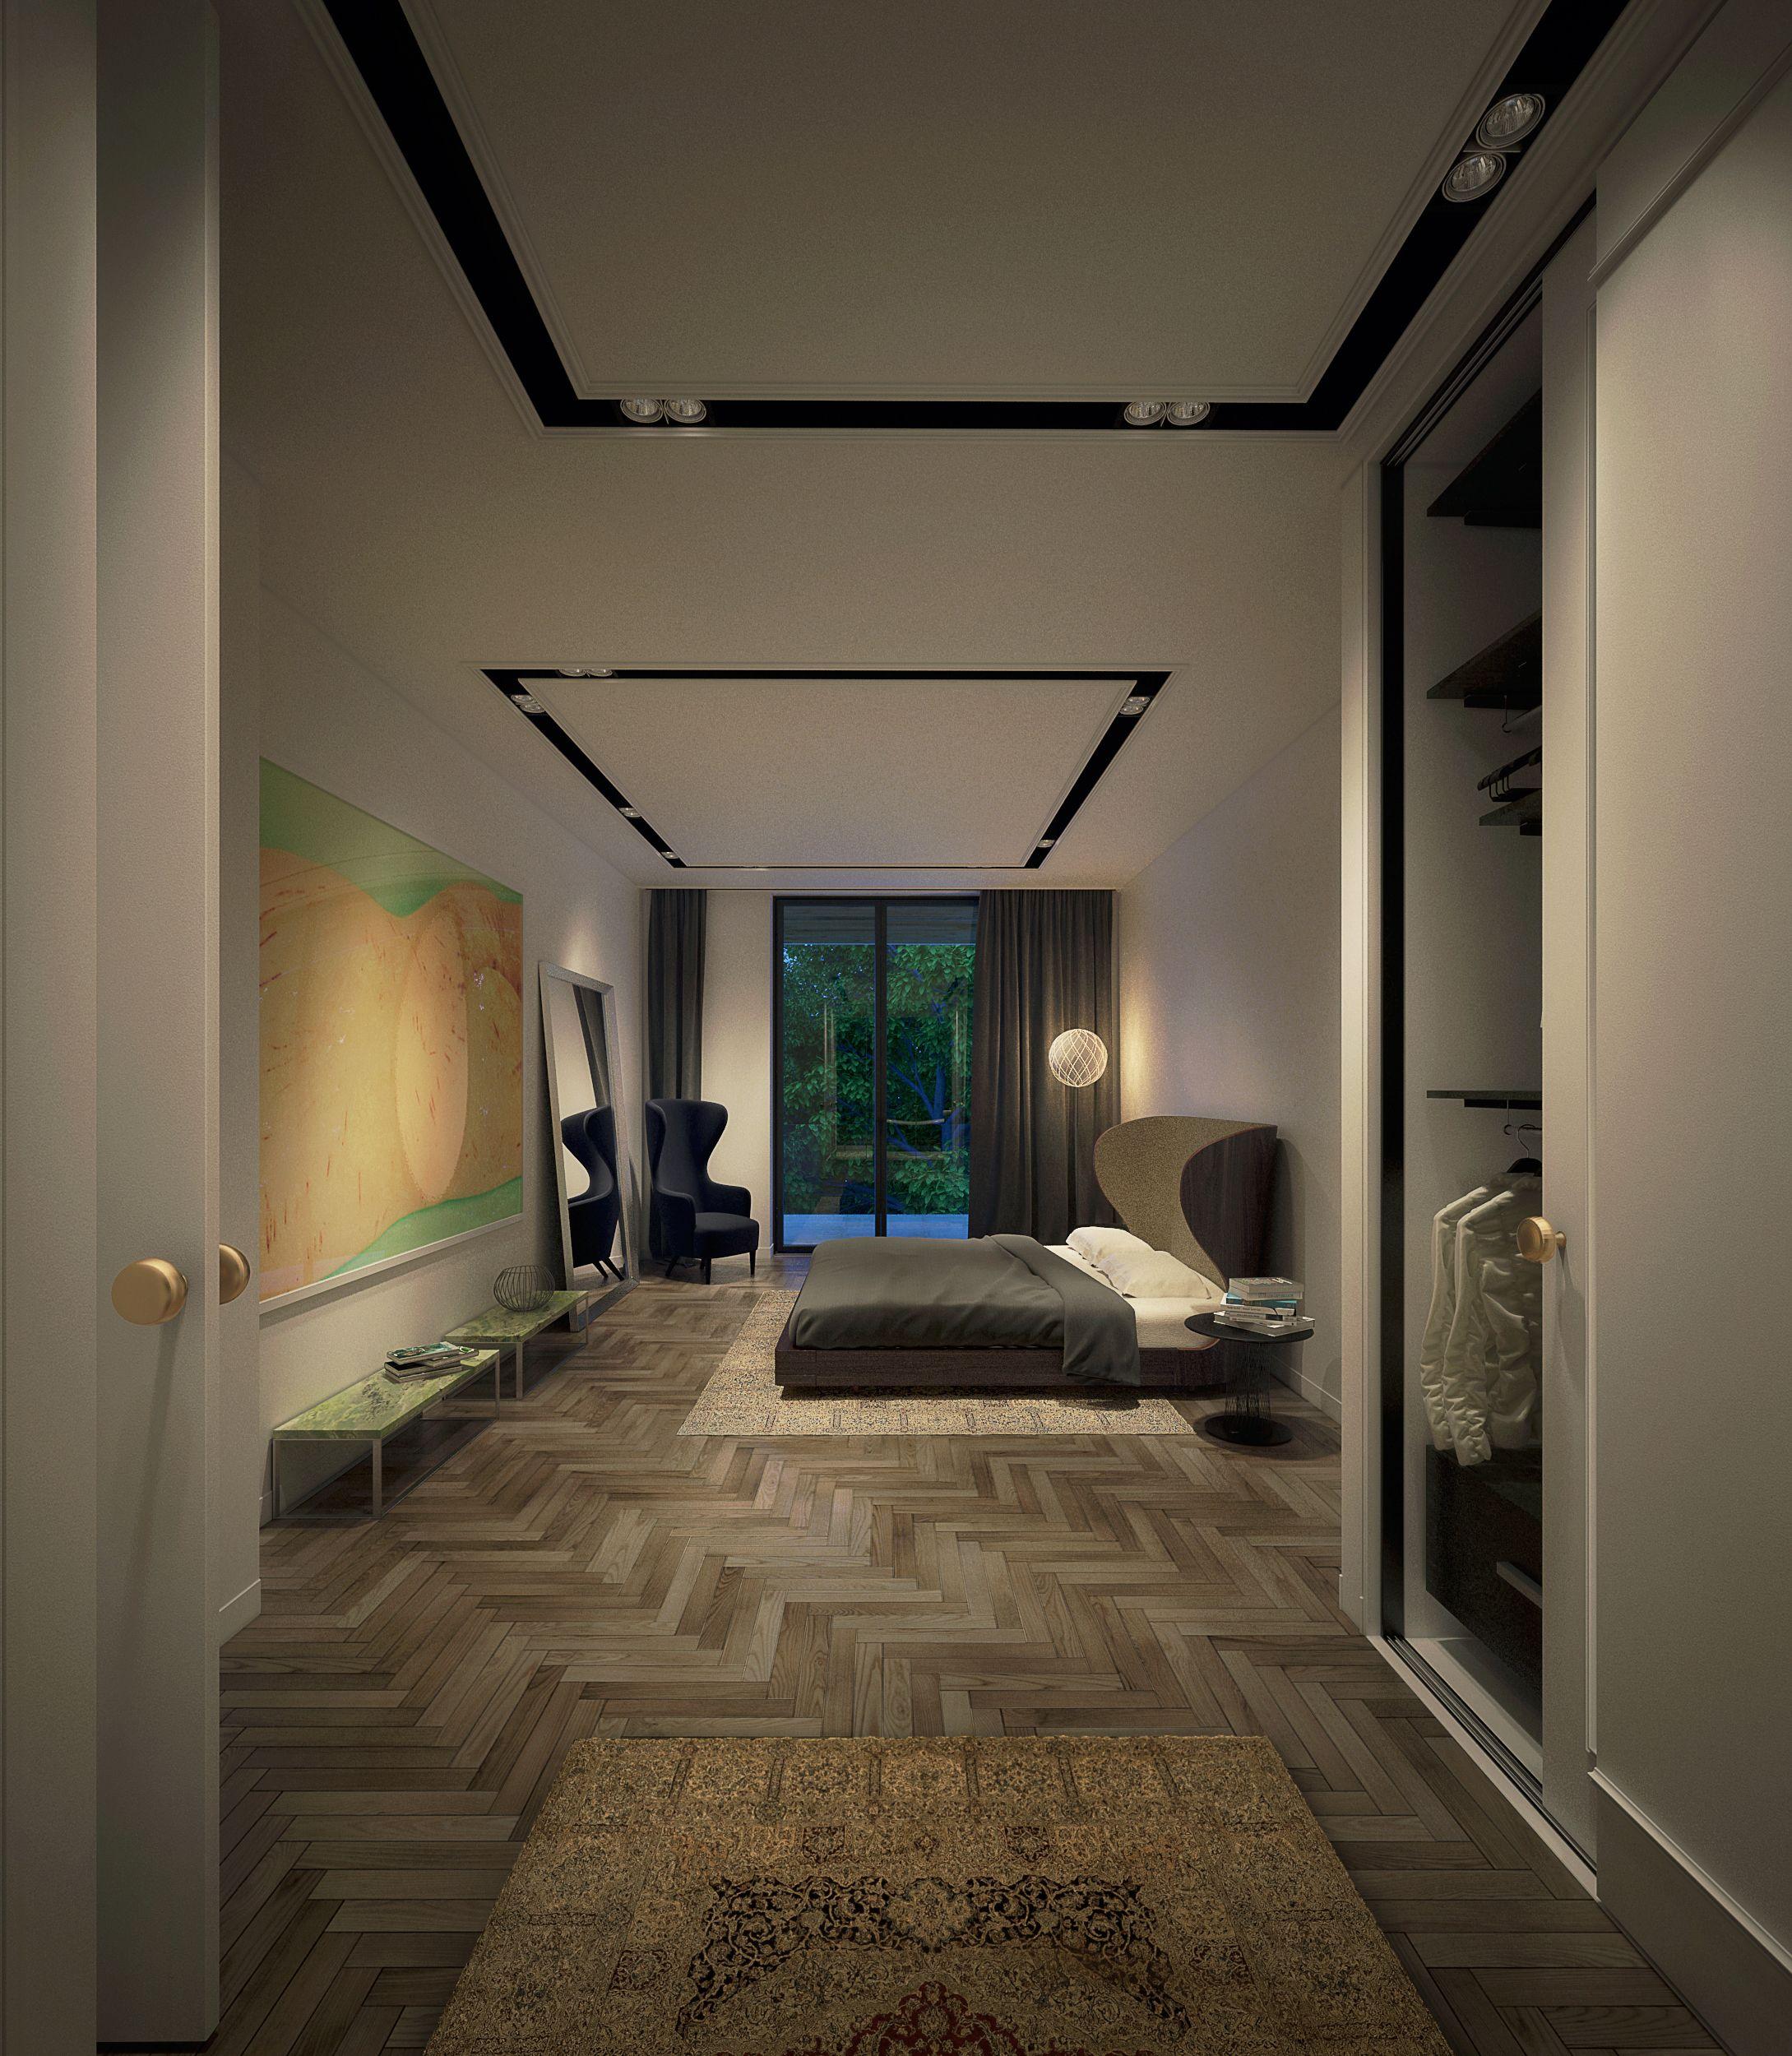 DOOI STUDIO Appartement 3 , Master Bedroom The Luxury Rahmaninov Residence,  Bucharest , Romania